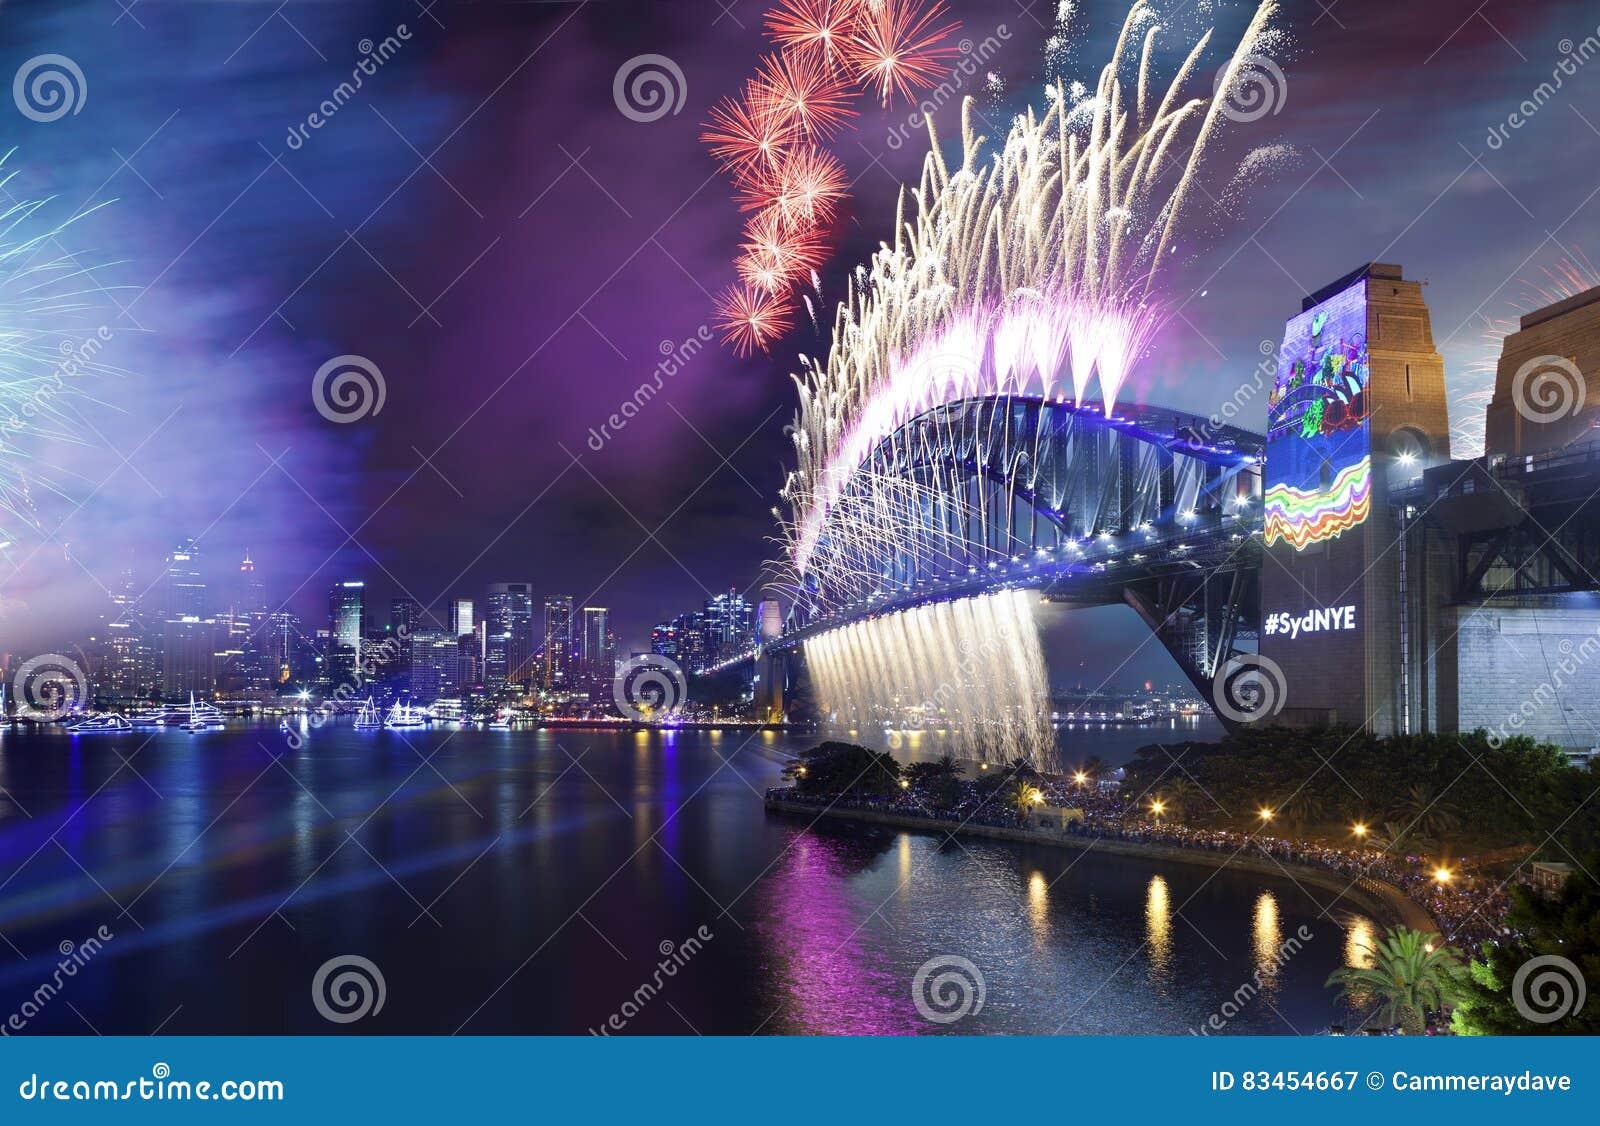 Download 烟花悉尼港桥 库存图片. 图片 包括有 威尔士, 夜间, 旅游业, 晚上, 贿赂, 地标, 活动, 布哈拉 - 83454667